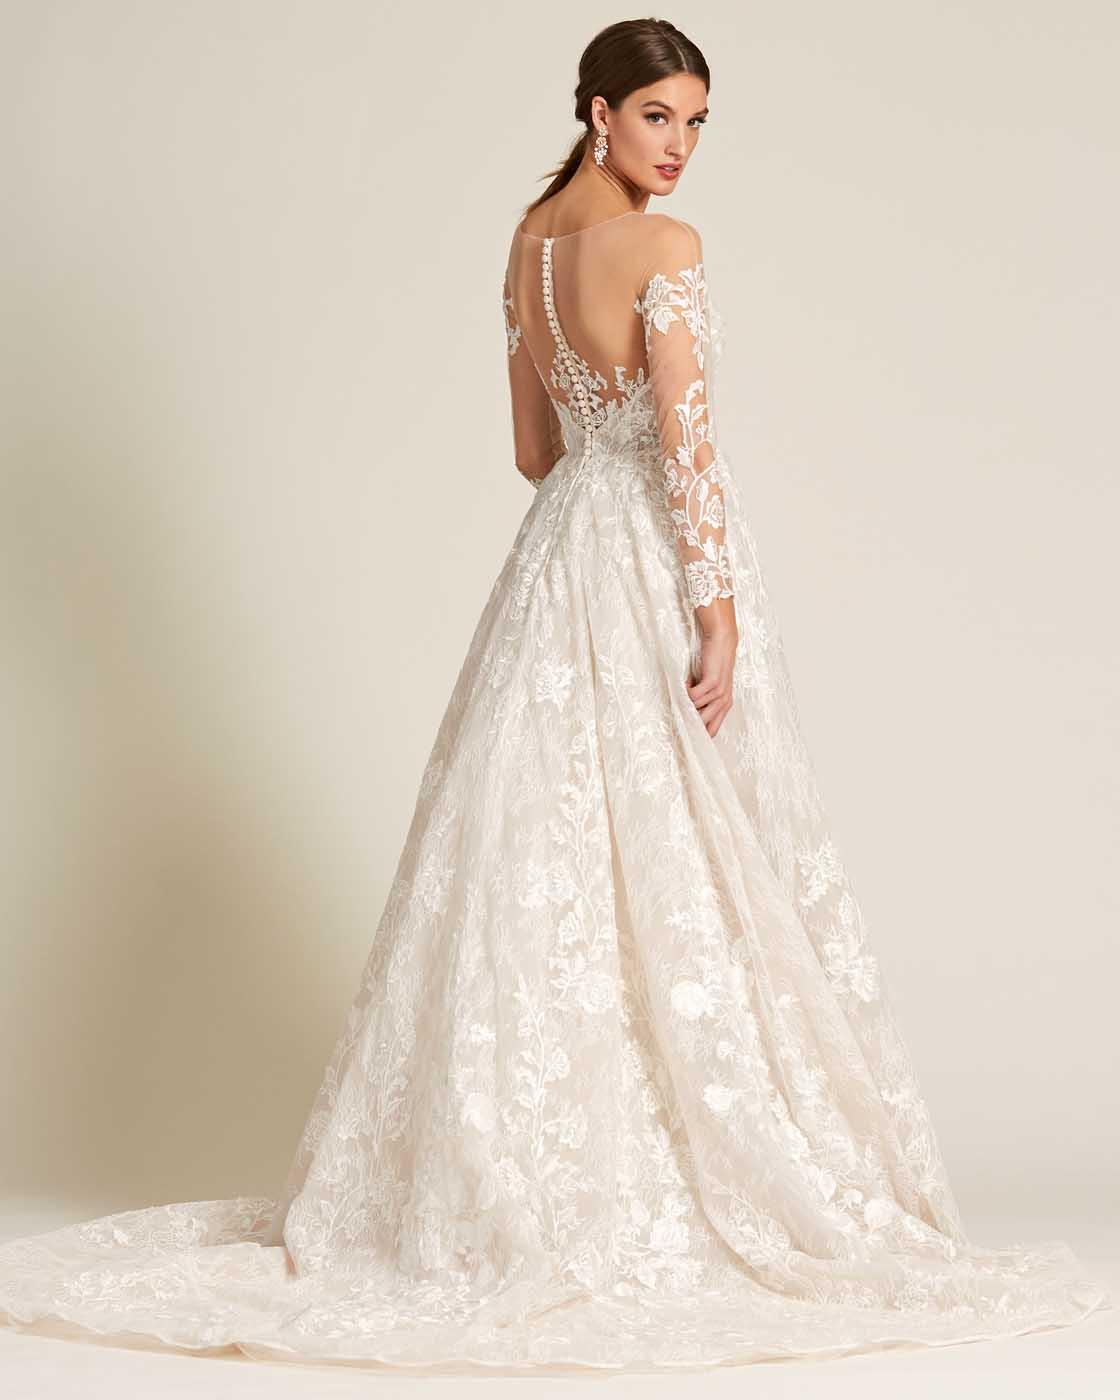 White Illusion Neckline Embroidered Sleeves Wedding Dress - Back